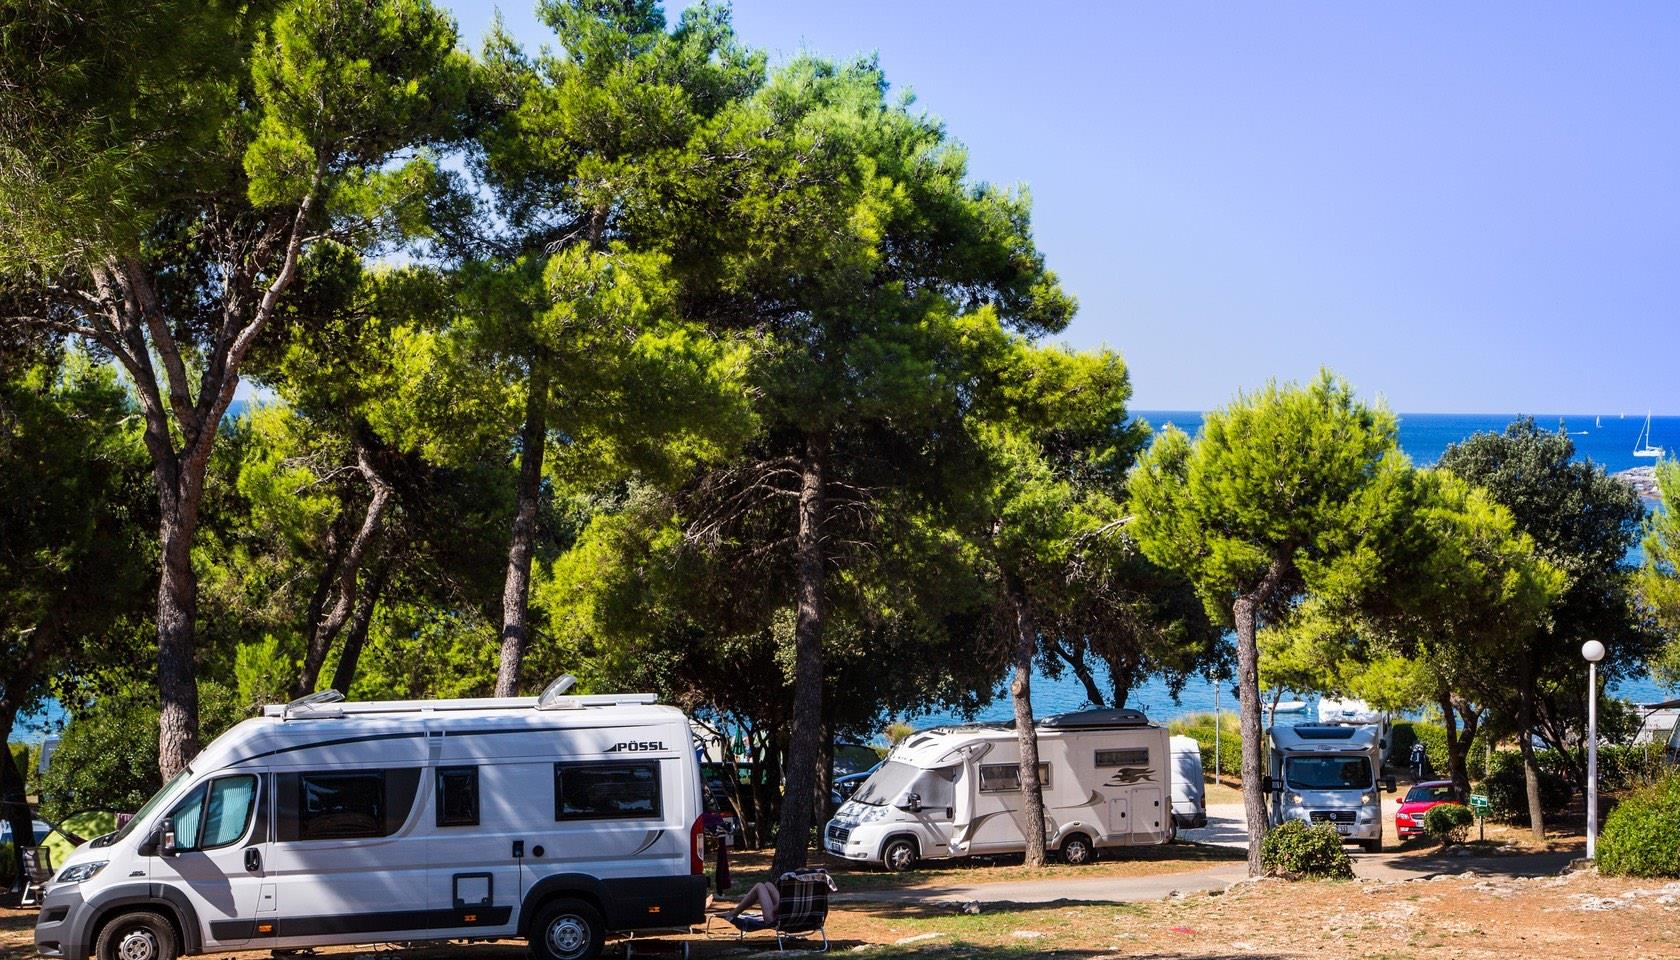 Emplacement - Standard Lot A - Camp Arena Indije